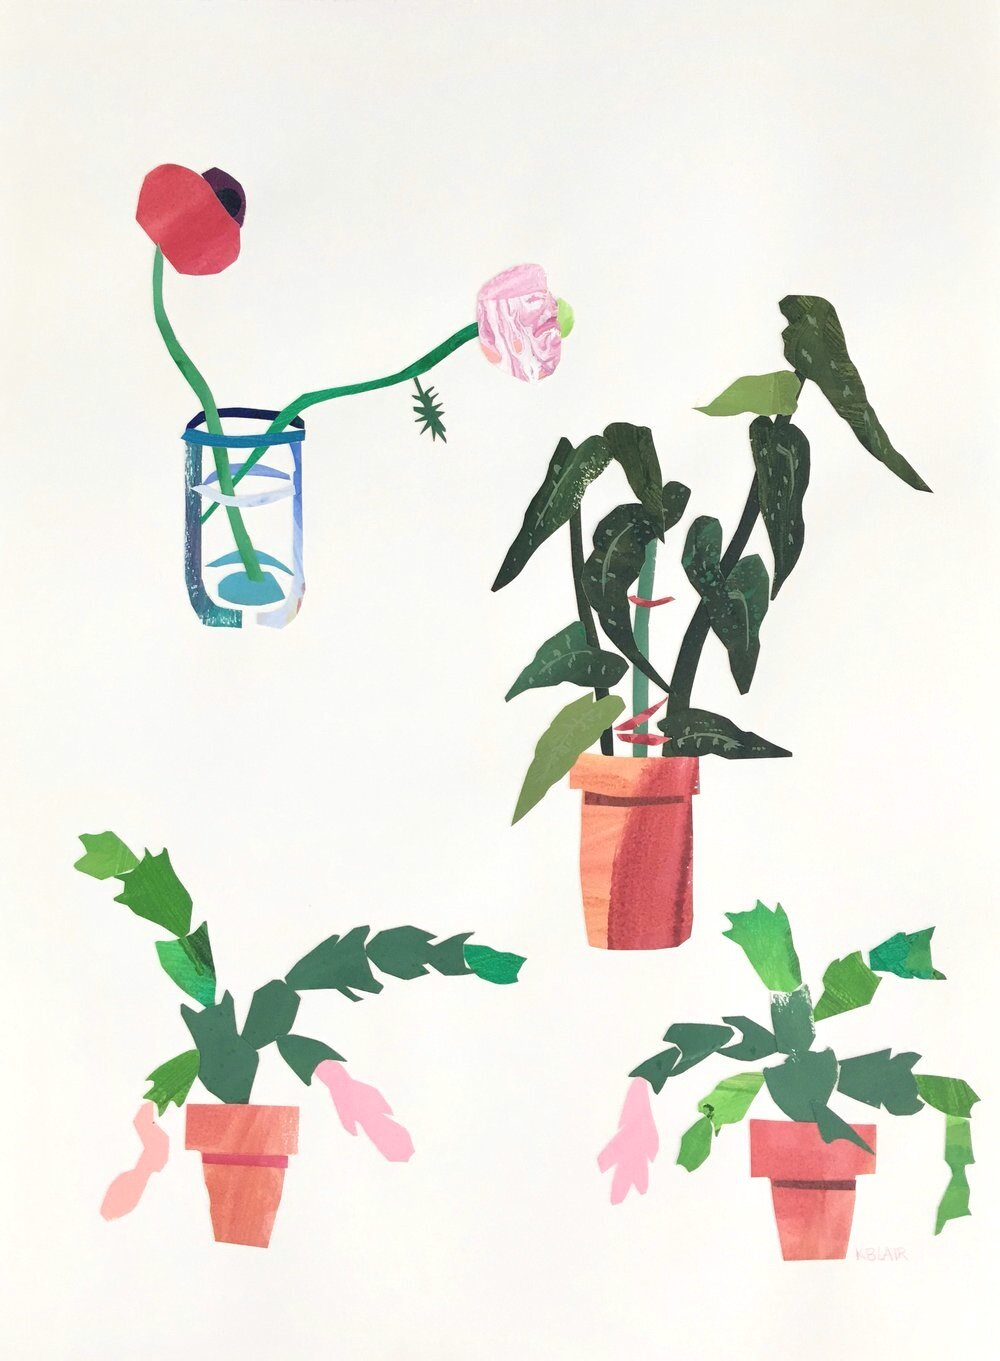 Collage, Potting Shed I, 30x23